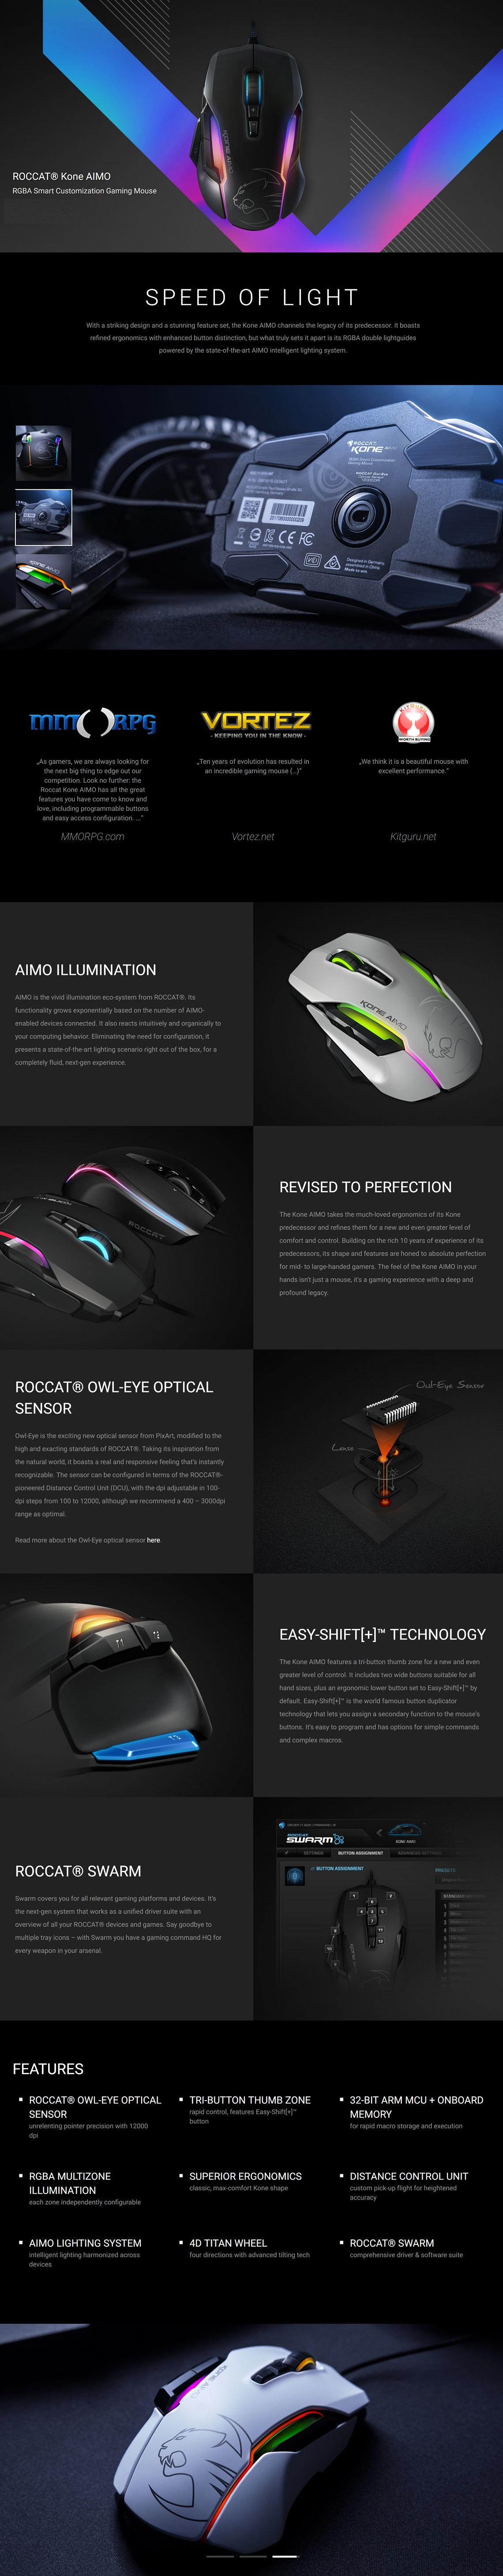 Roccat Kone AIMO RGBA Smart Customization Gaming Mouse - White Version